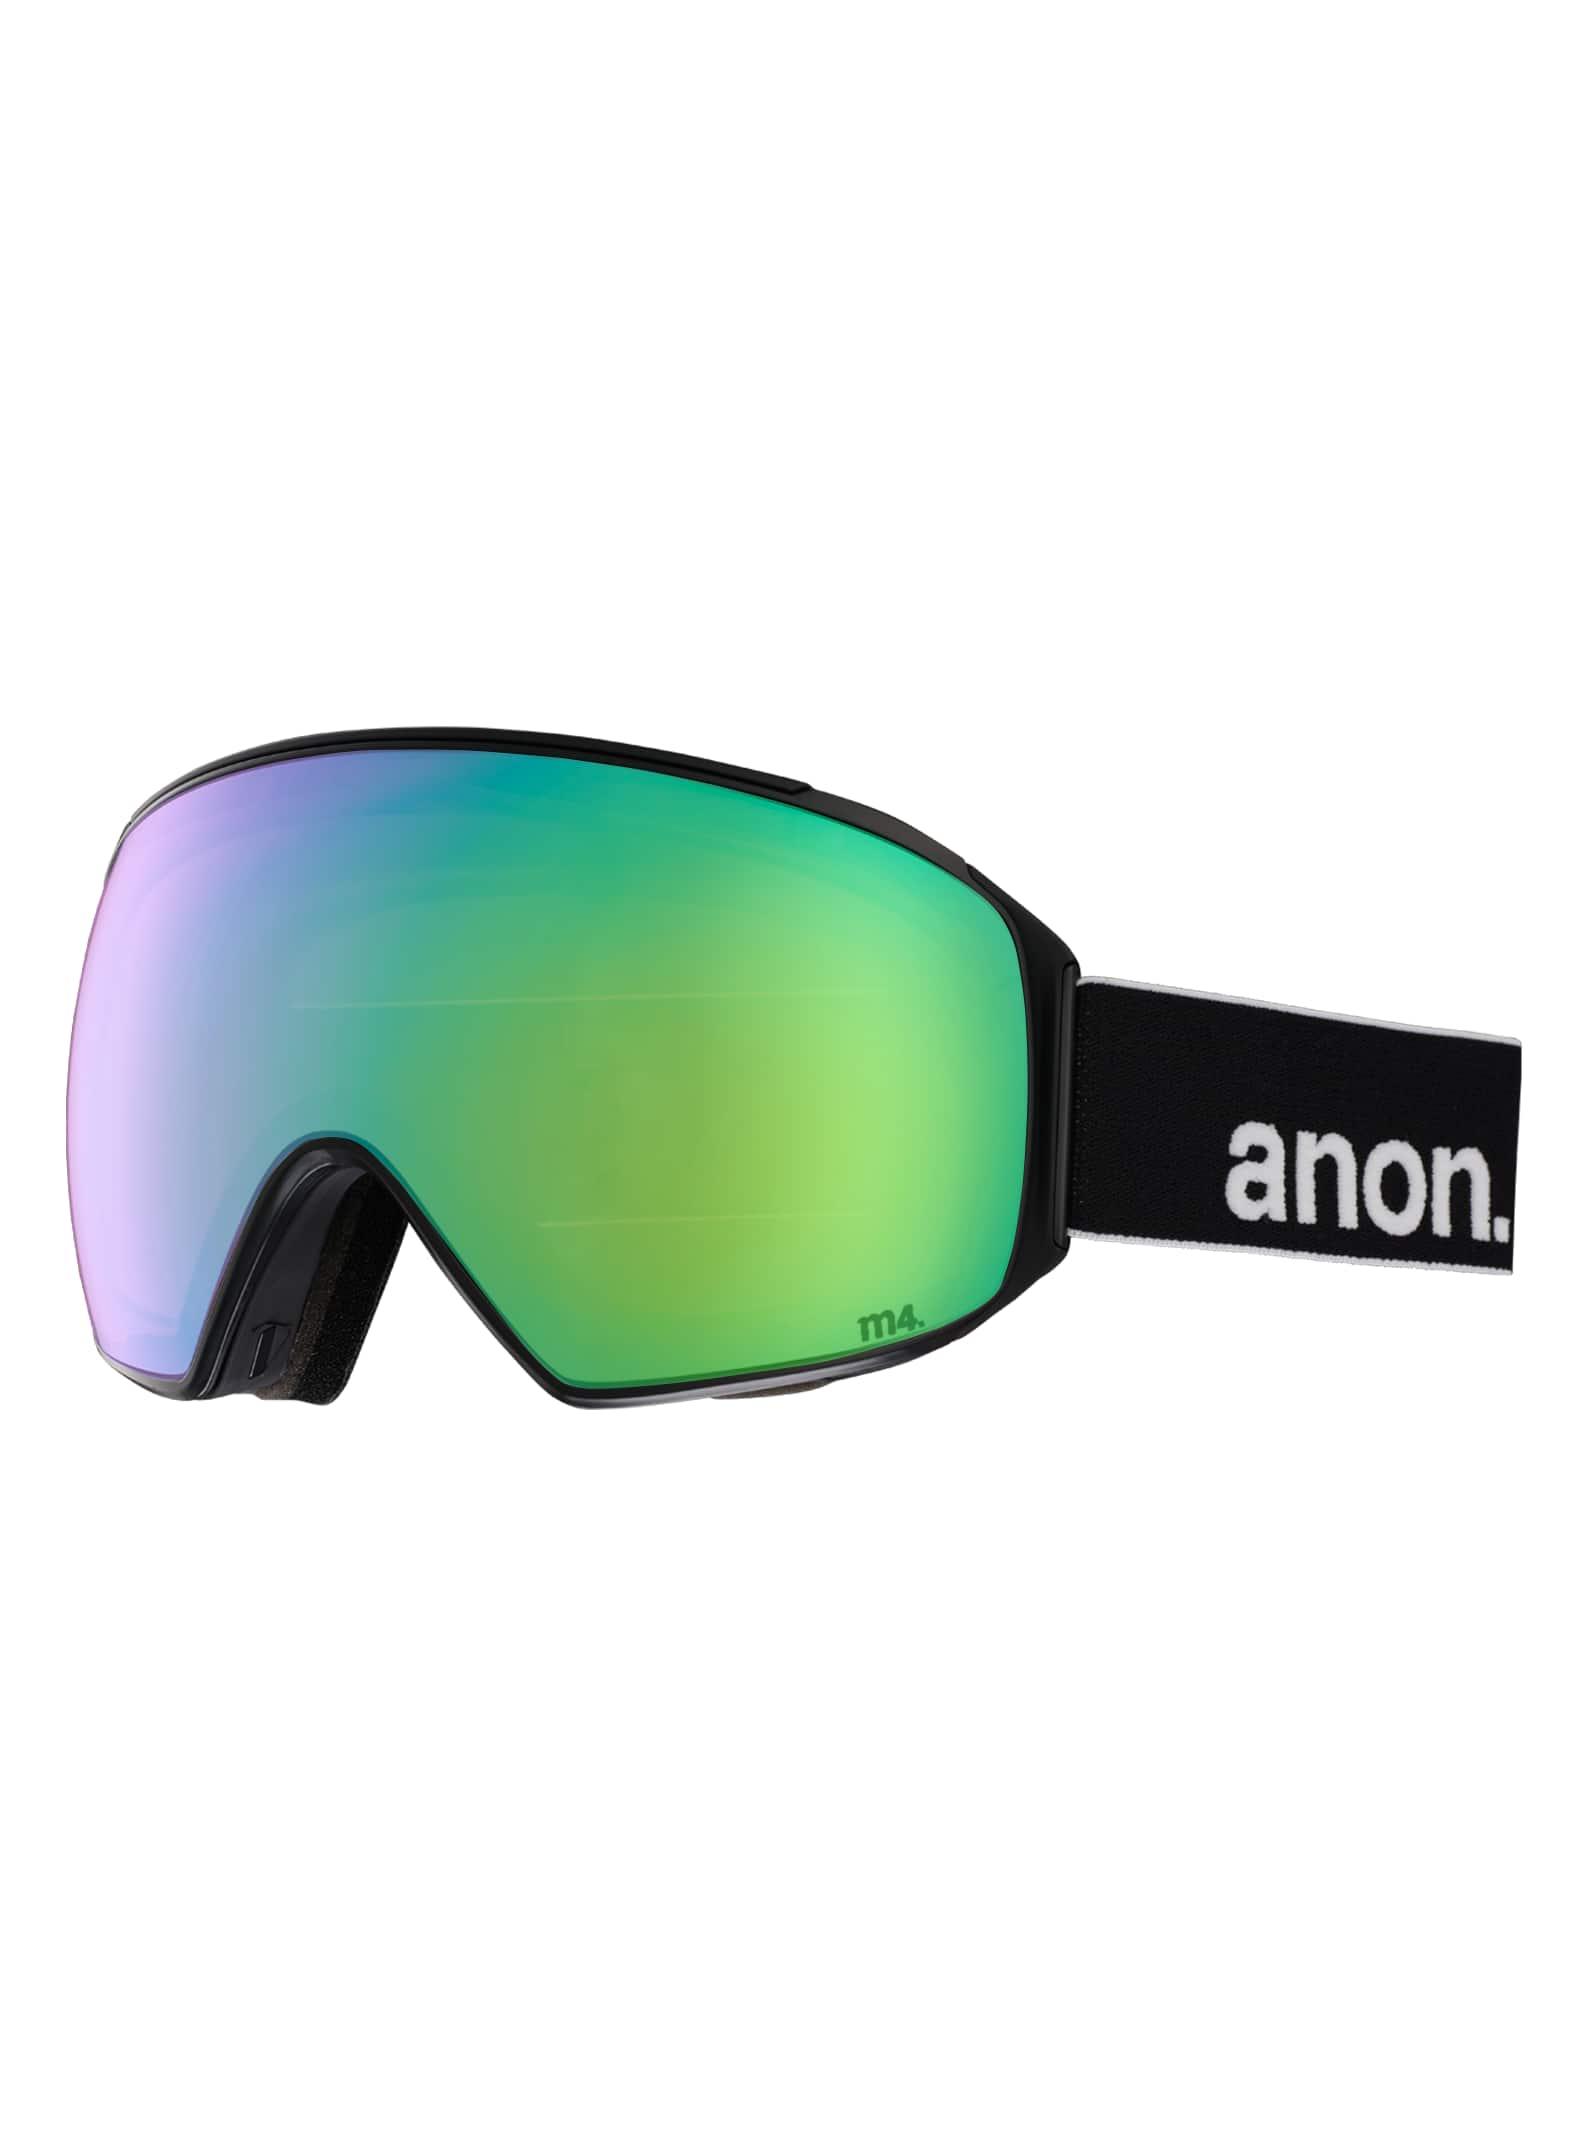 5bcd5f8b67d3 Men s Anon M4 Toric Goggle + Spare Lens + MFI